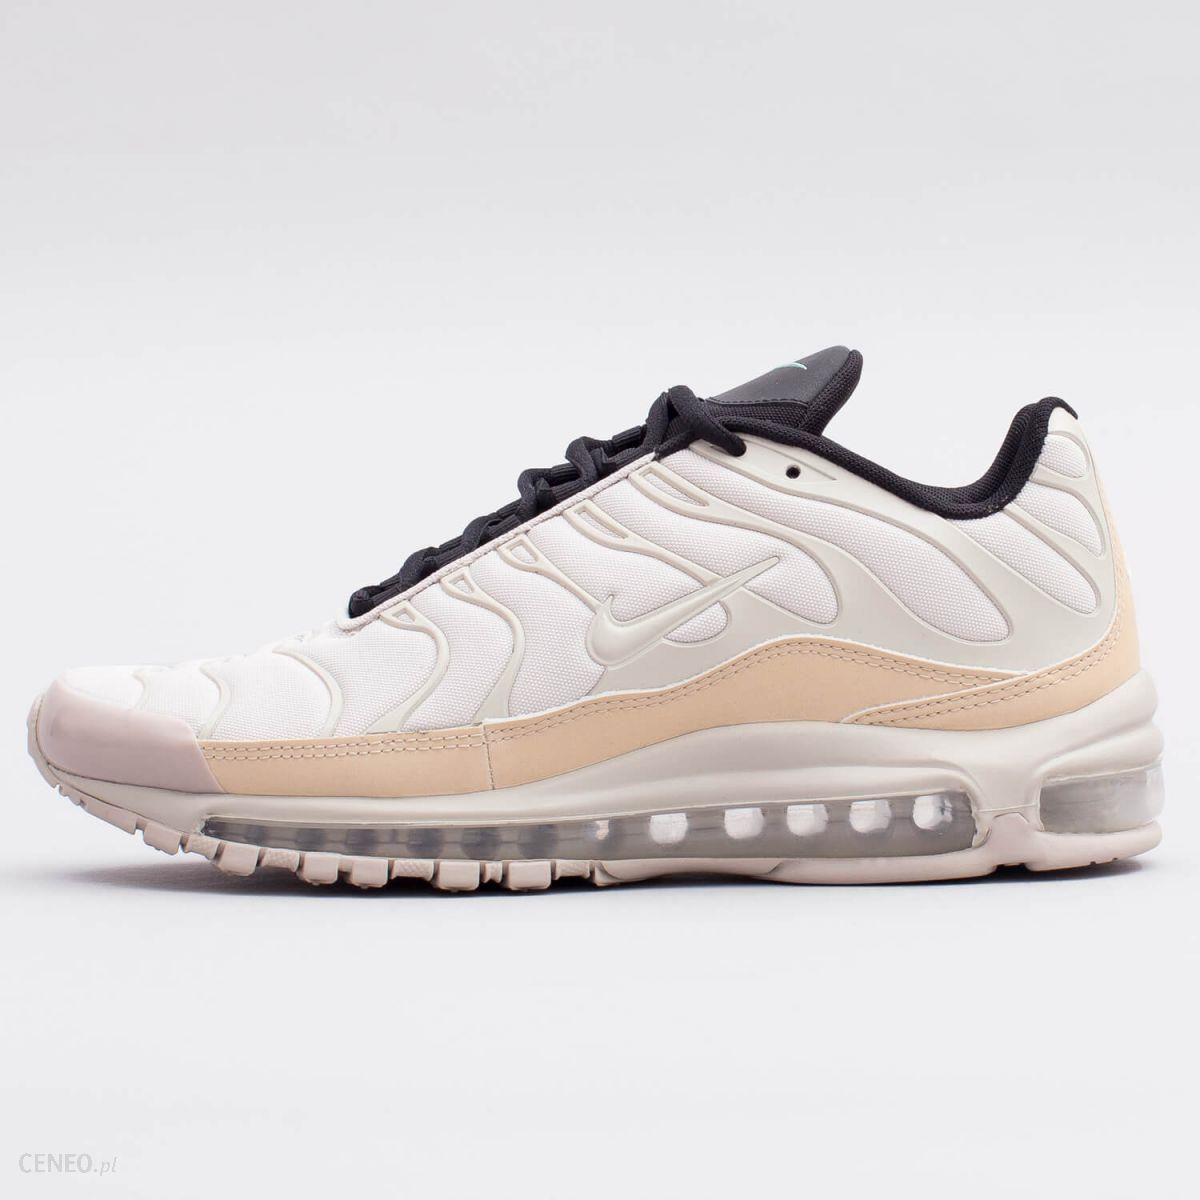 Nike AIR MAX 97 PLUS AH8144 101 Ceny i opinie Ceneo.pl